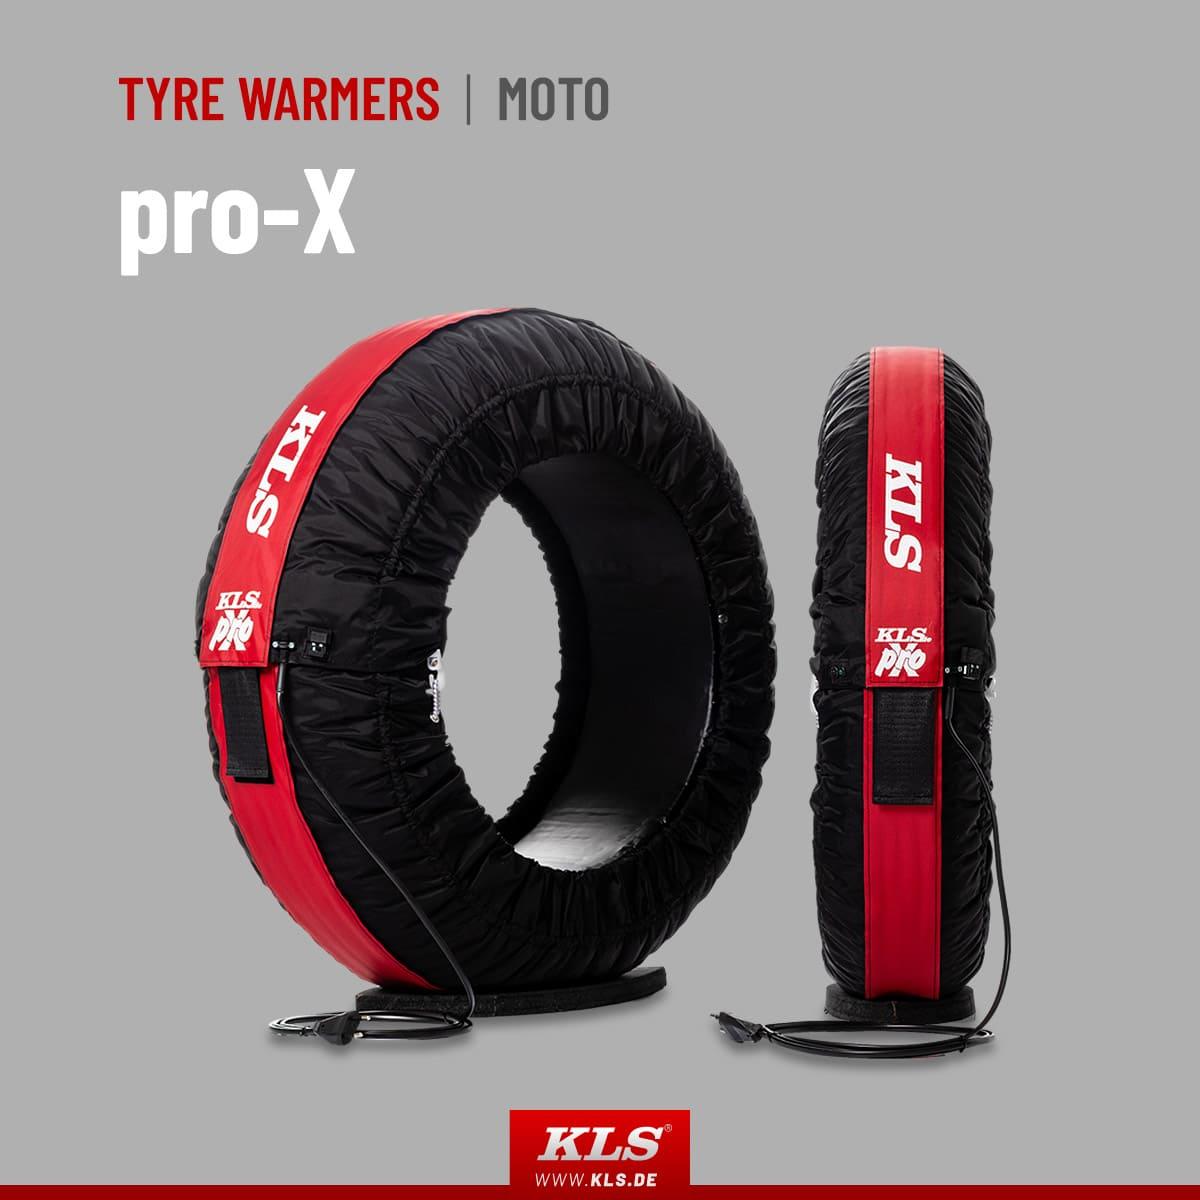 plate-kls-reifenwaermer-moto-pro-x